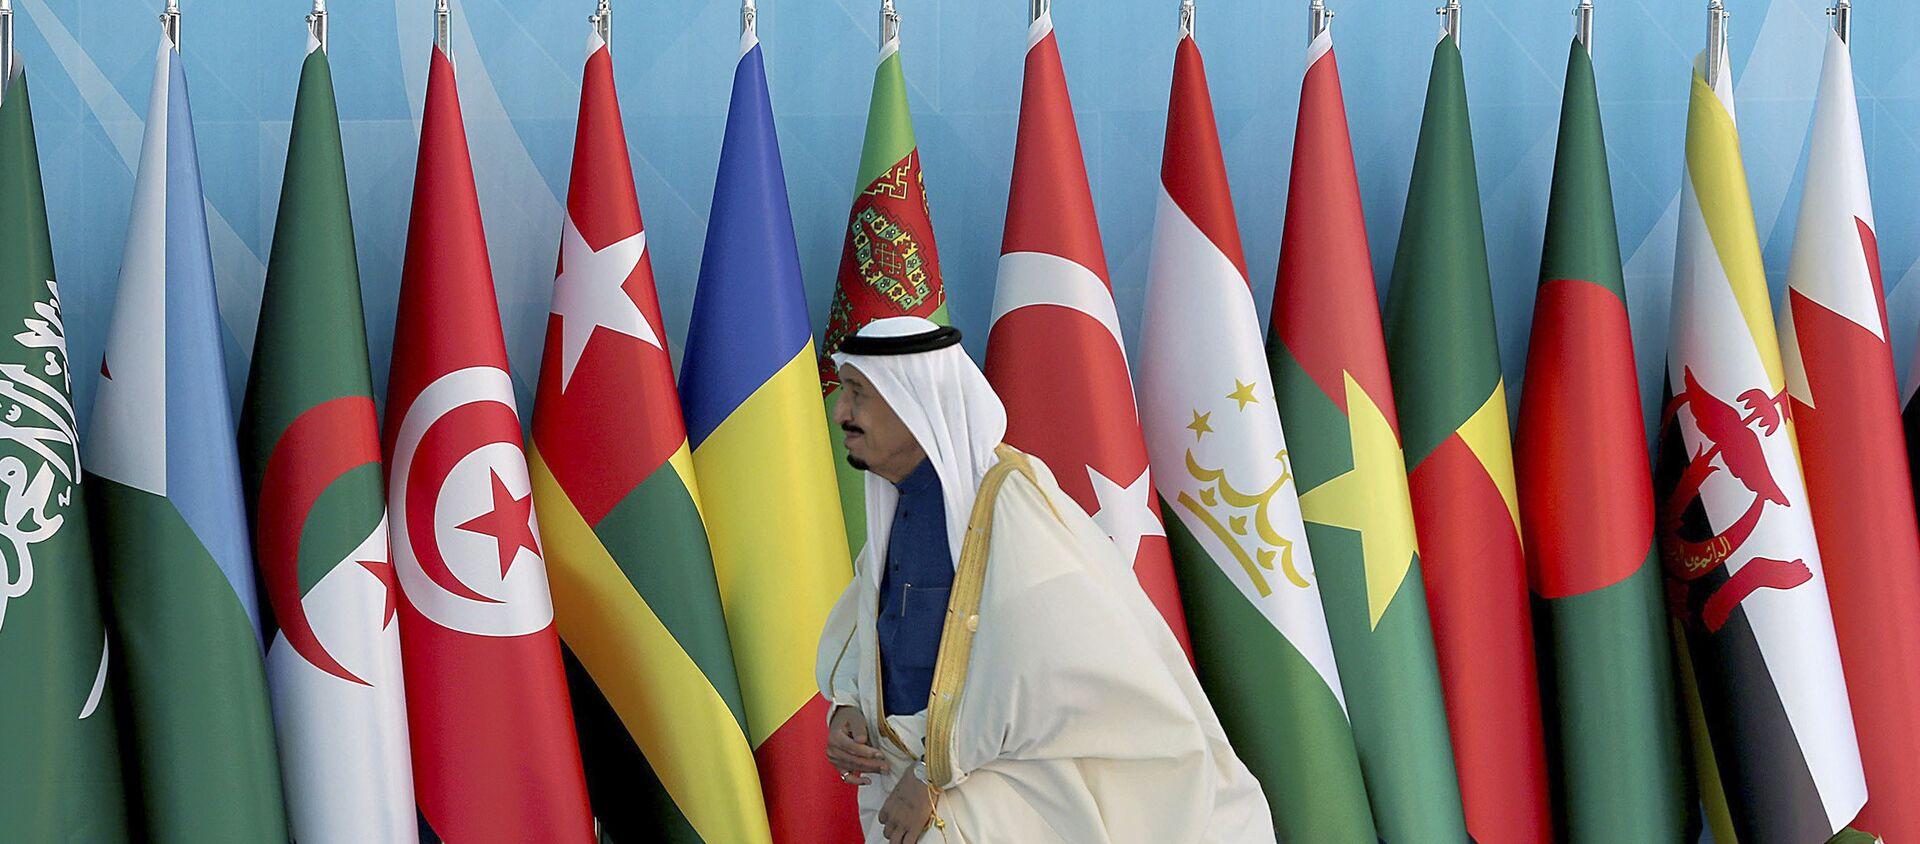 Флаги стран ОИС во время саммита в Стамбуле, 14 апреля 2016 года - Sputnik Азербайджан, 1920, 08.04.2021